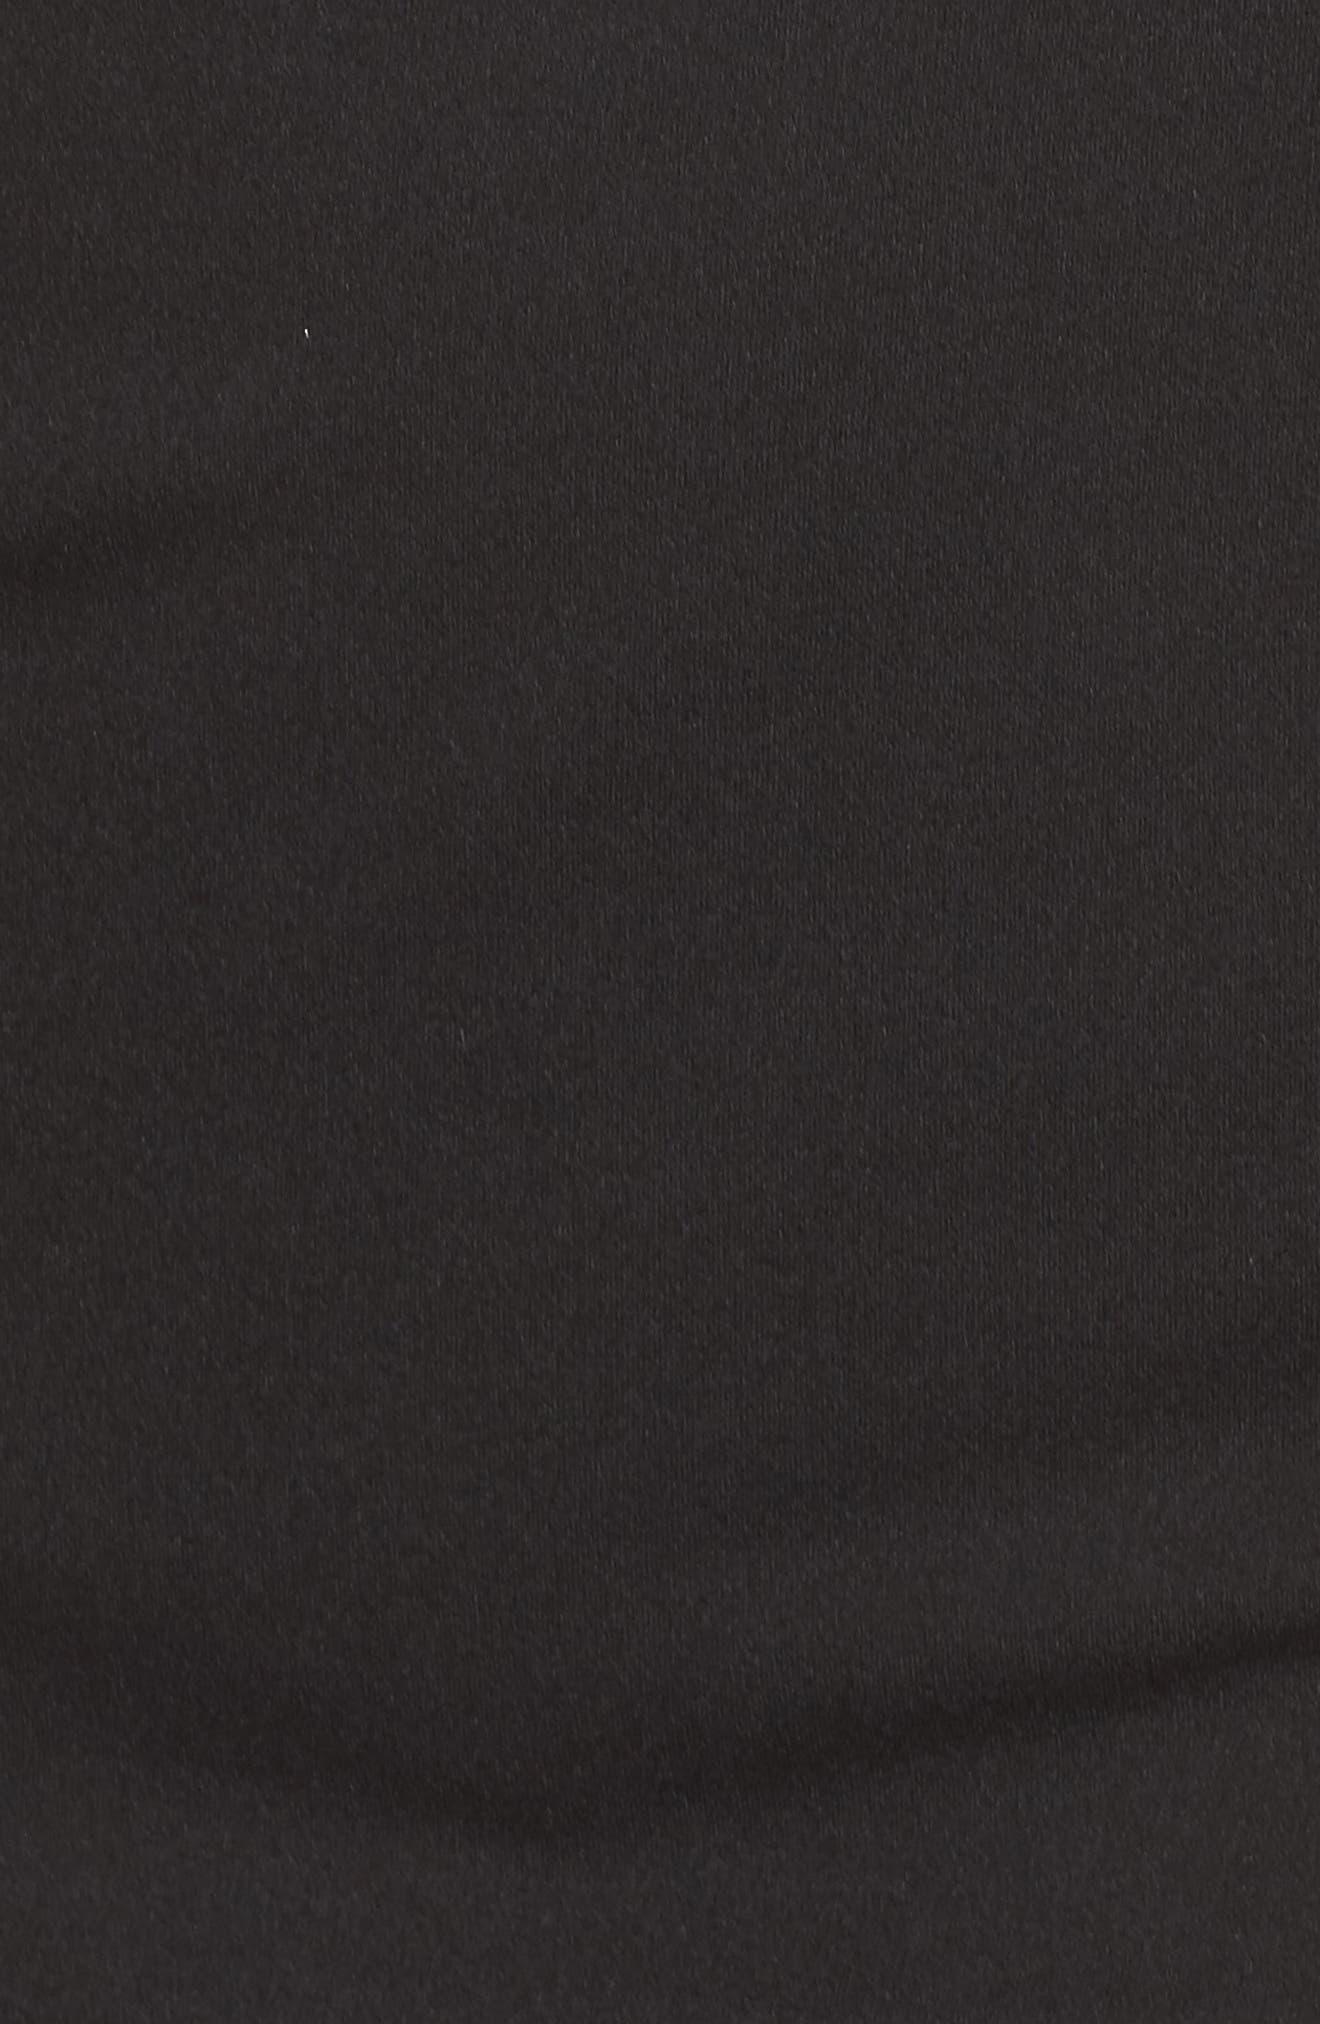 Embellished Crepe Sheath Dress,                             Alternate thumbnail 5, color,                             002